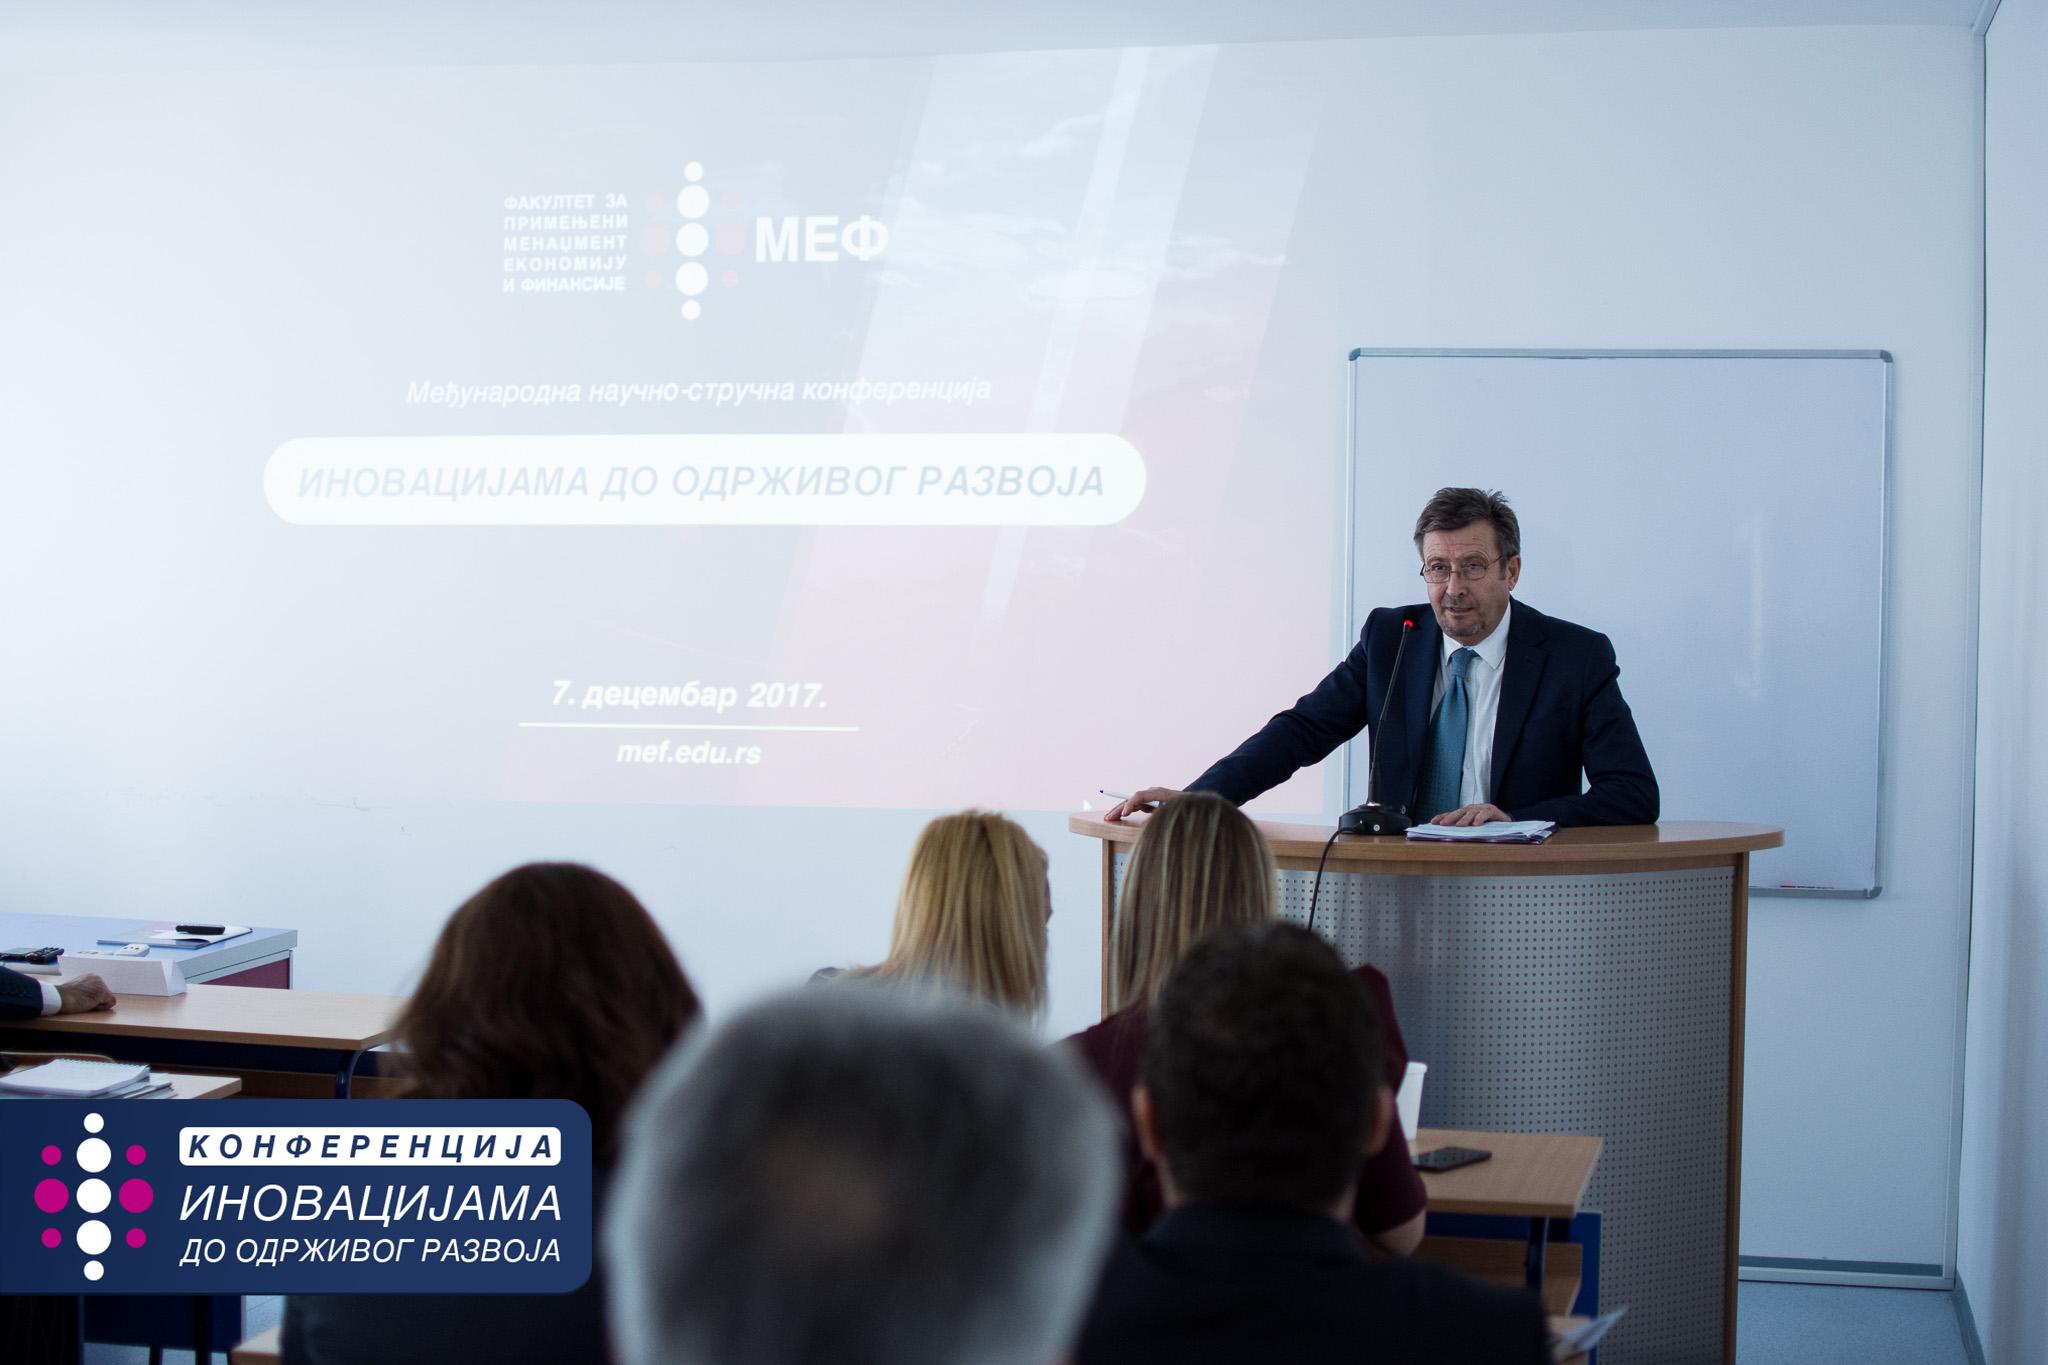 Miodrag Brzakovic - MEF Fakultet